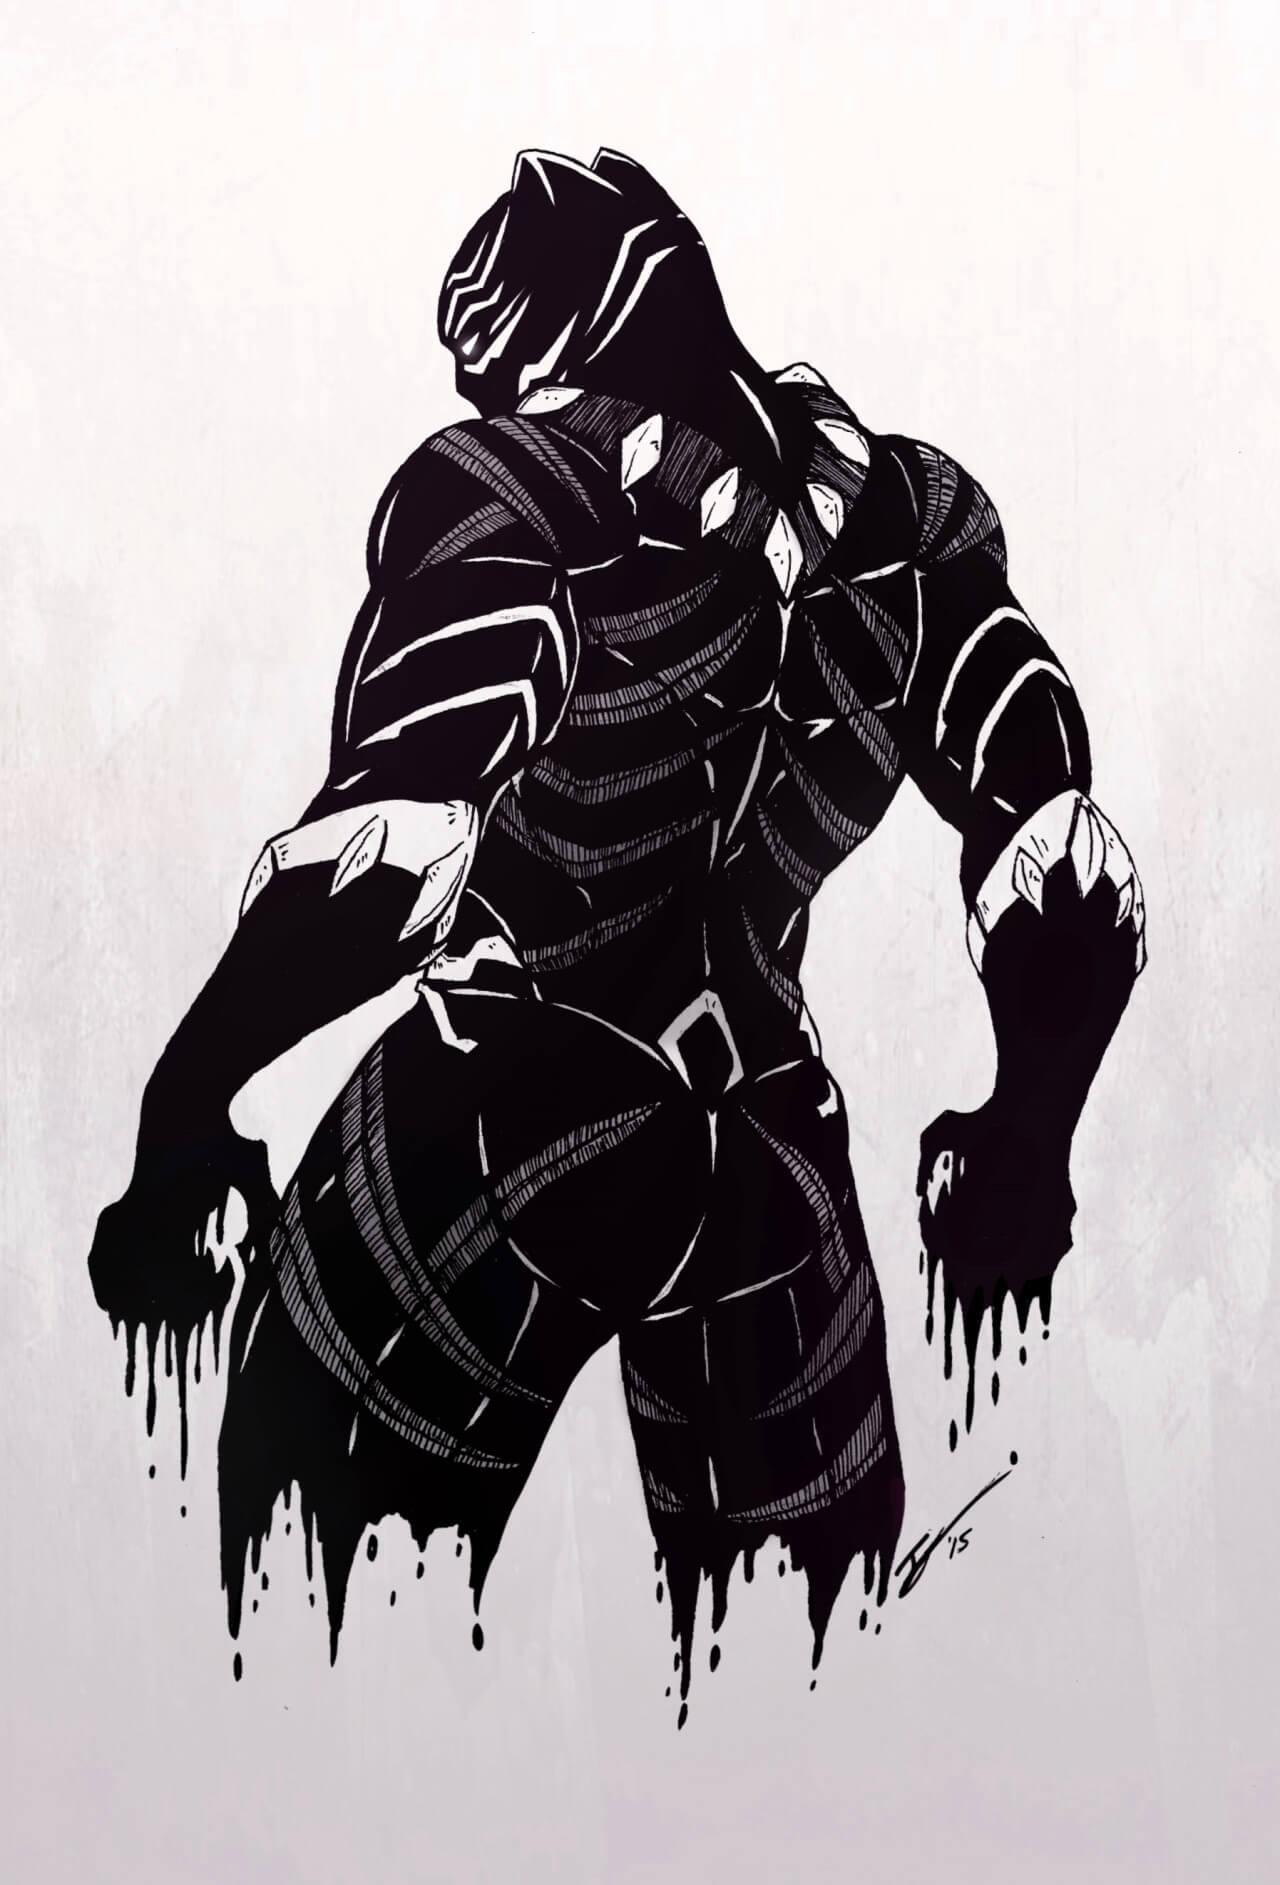 Black Panther Wallpaper by buh1 on DeviantArt